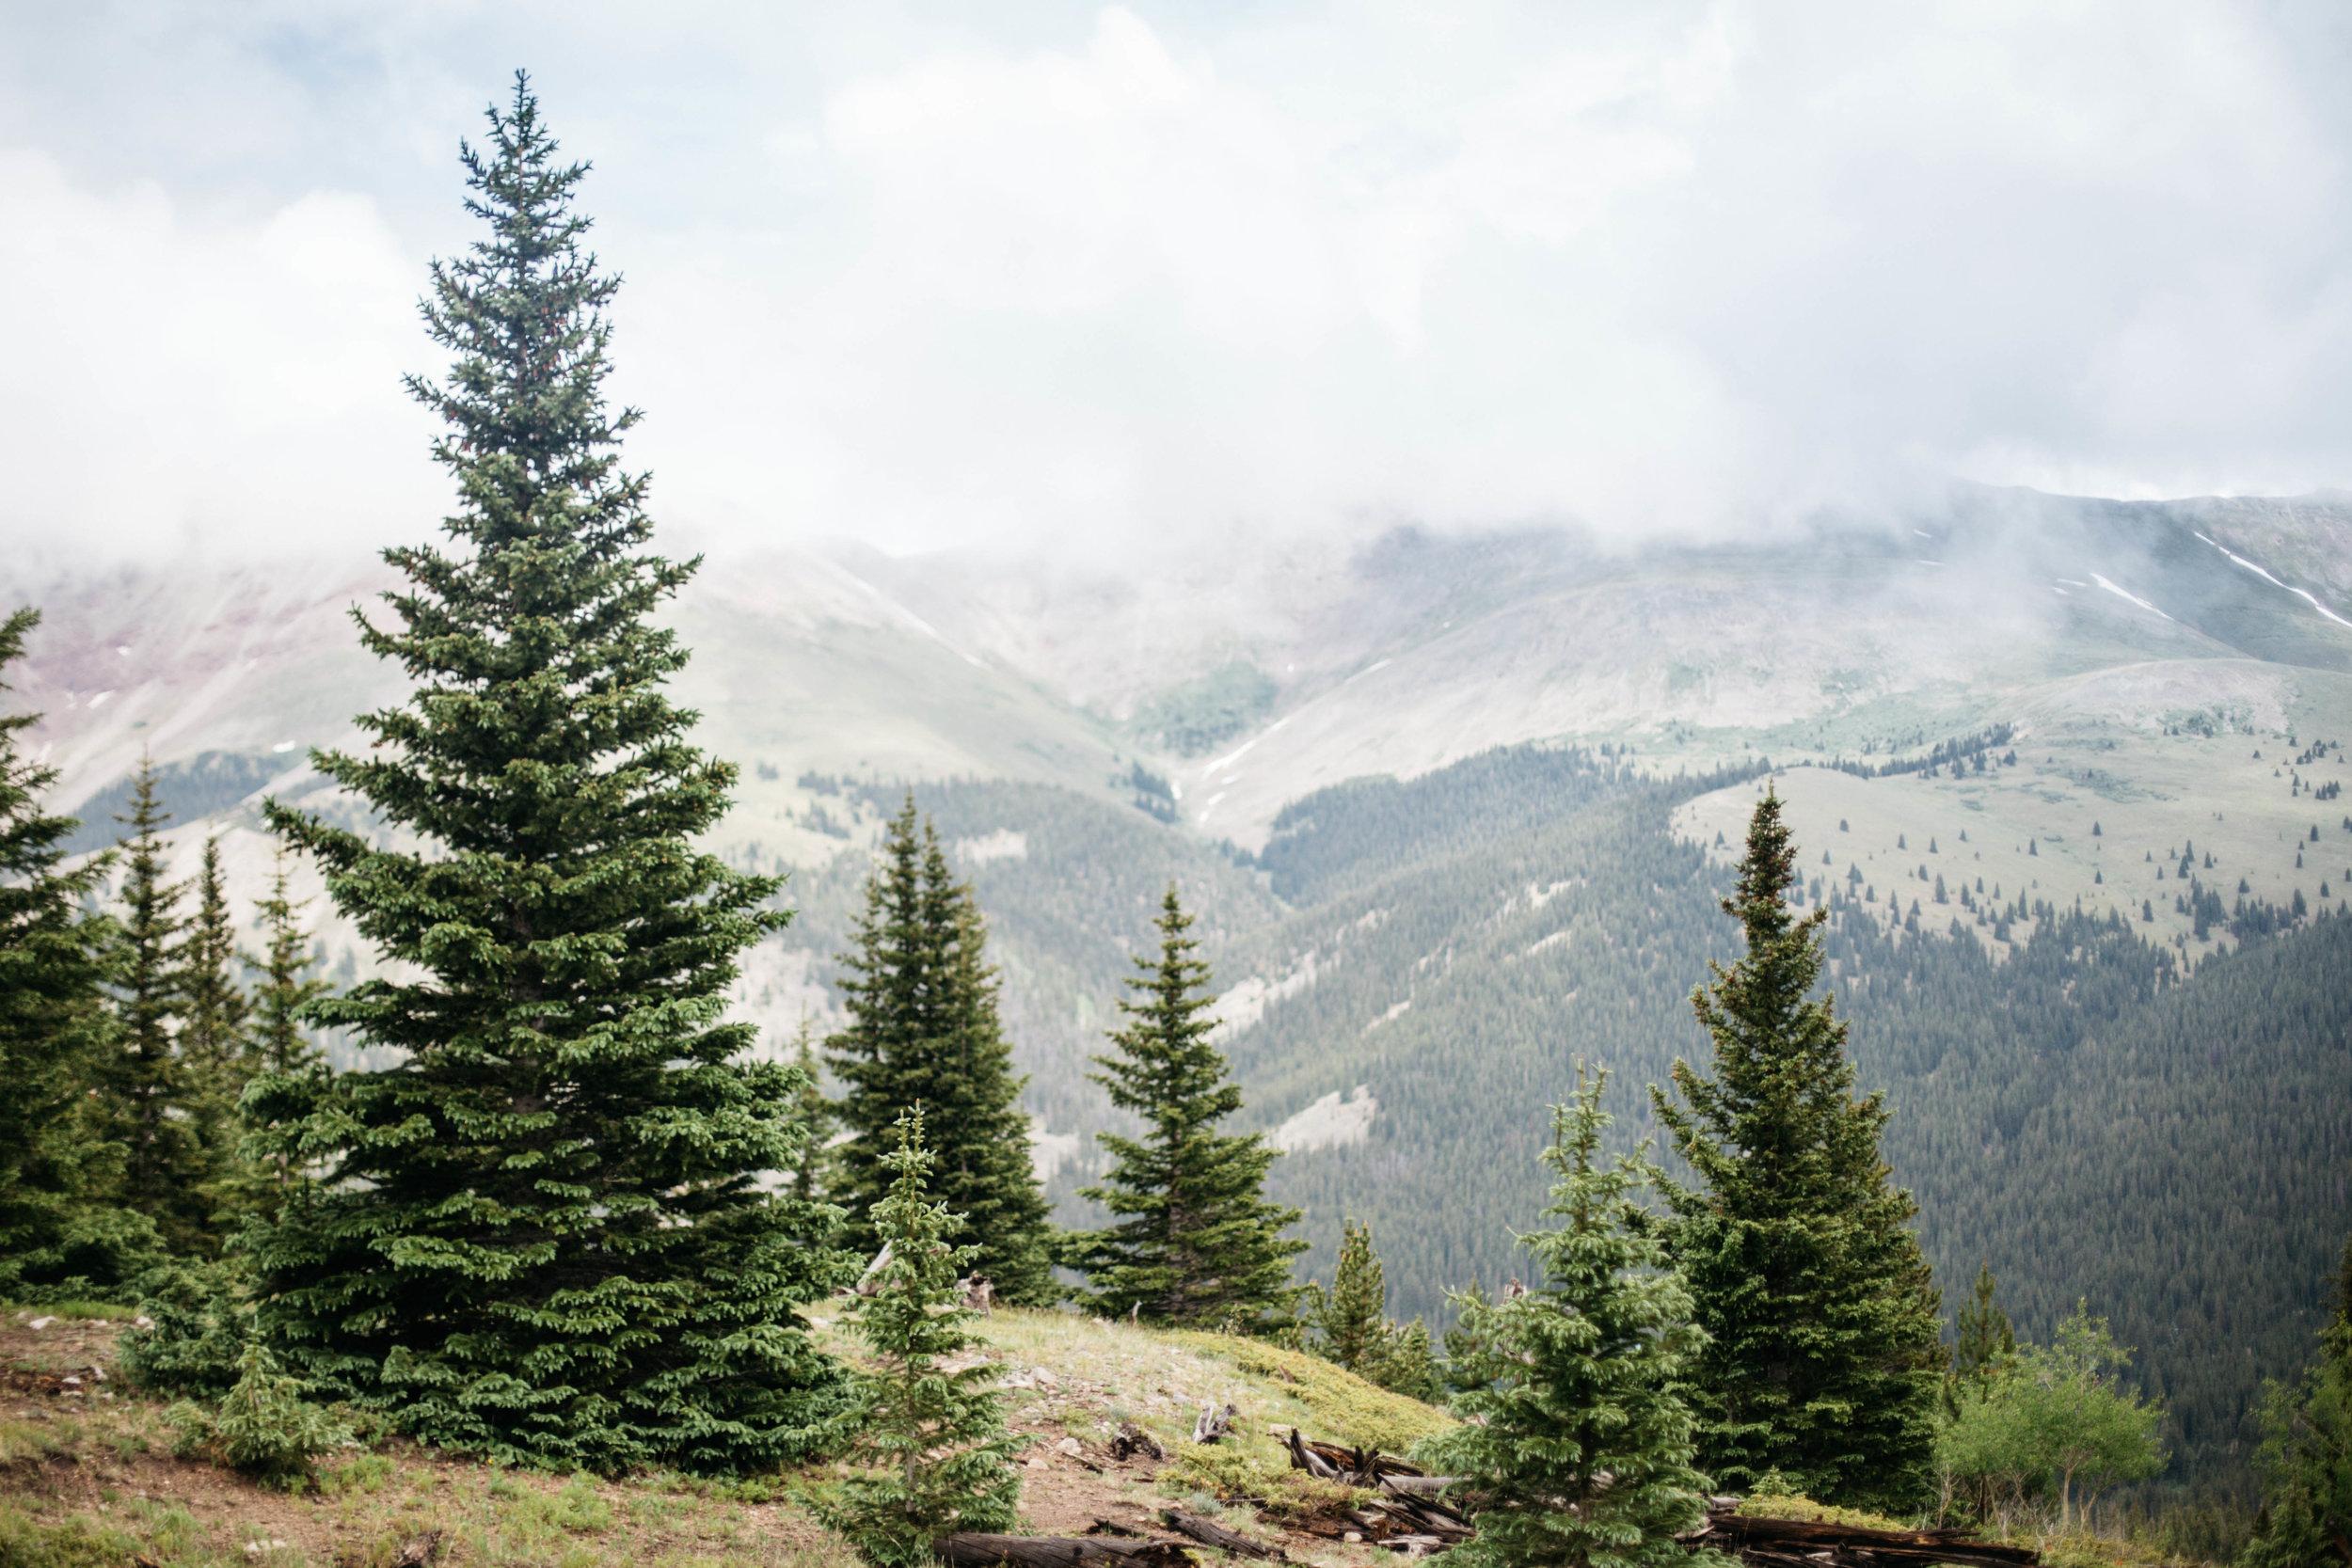 ColoradoGM2-66.jpg